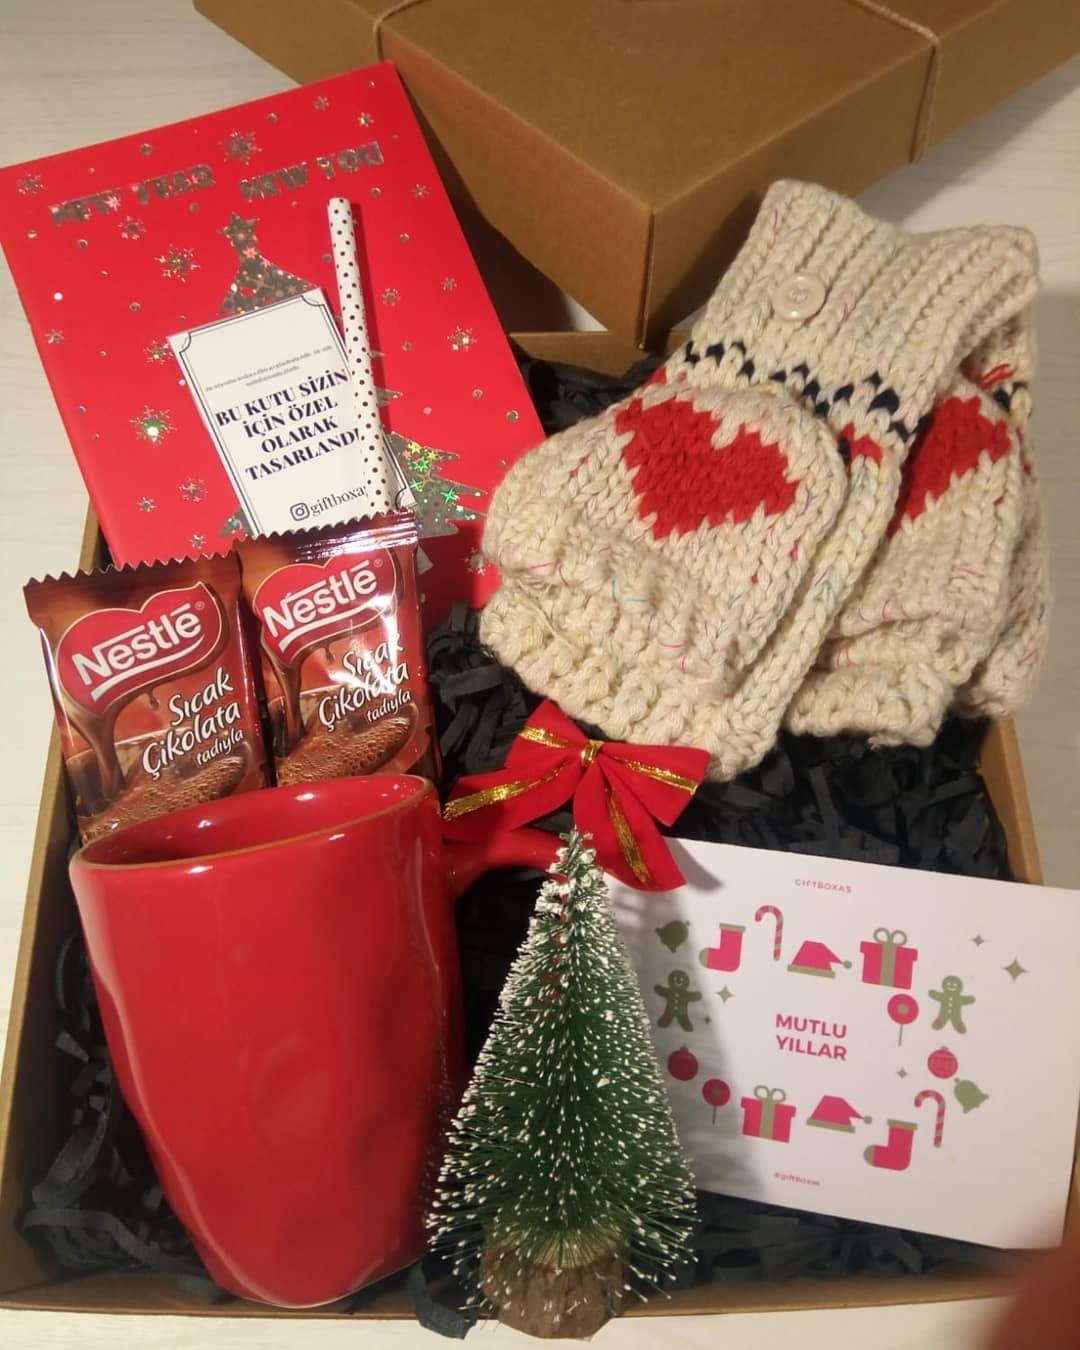 26 Begenme 6 Yorum Instagram Da Konsept Hediye Kutulari Giftboxas Sevgilinize Sicacik Bir Kutu Gondermek Ister Mis Gifts Winter Christmas Gift Wrapping